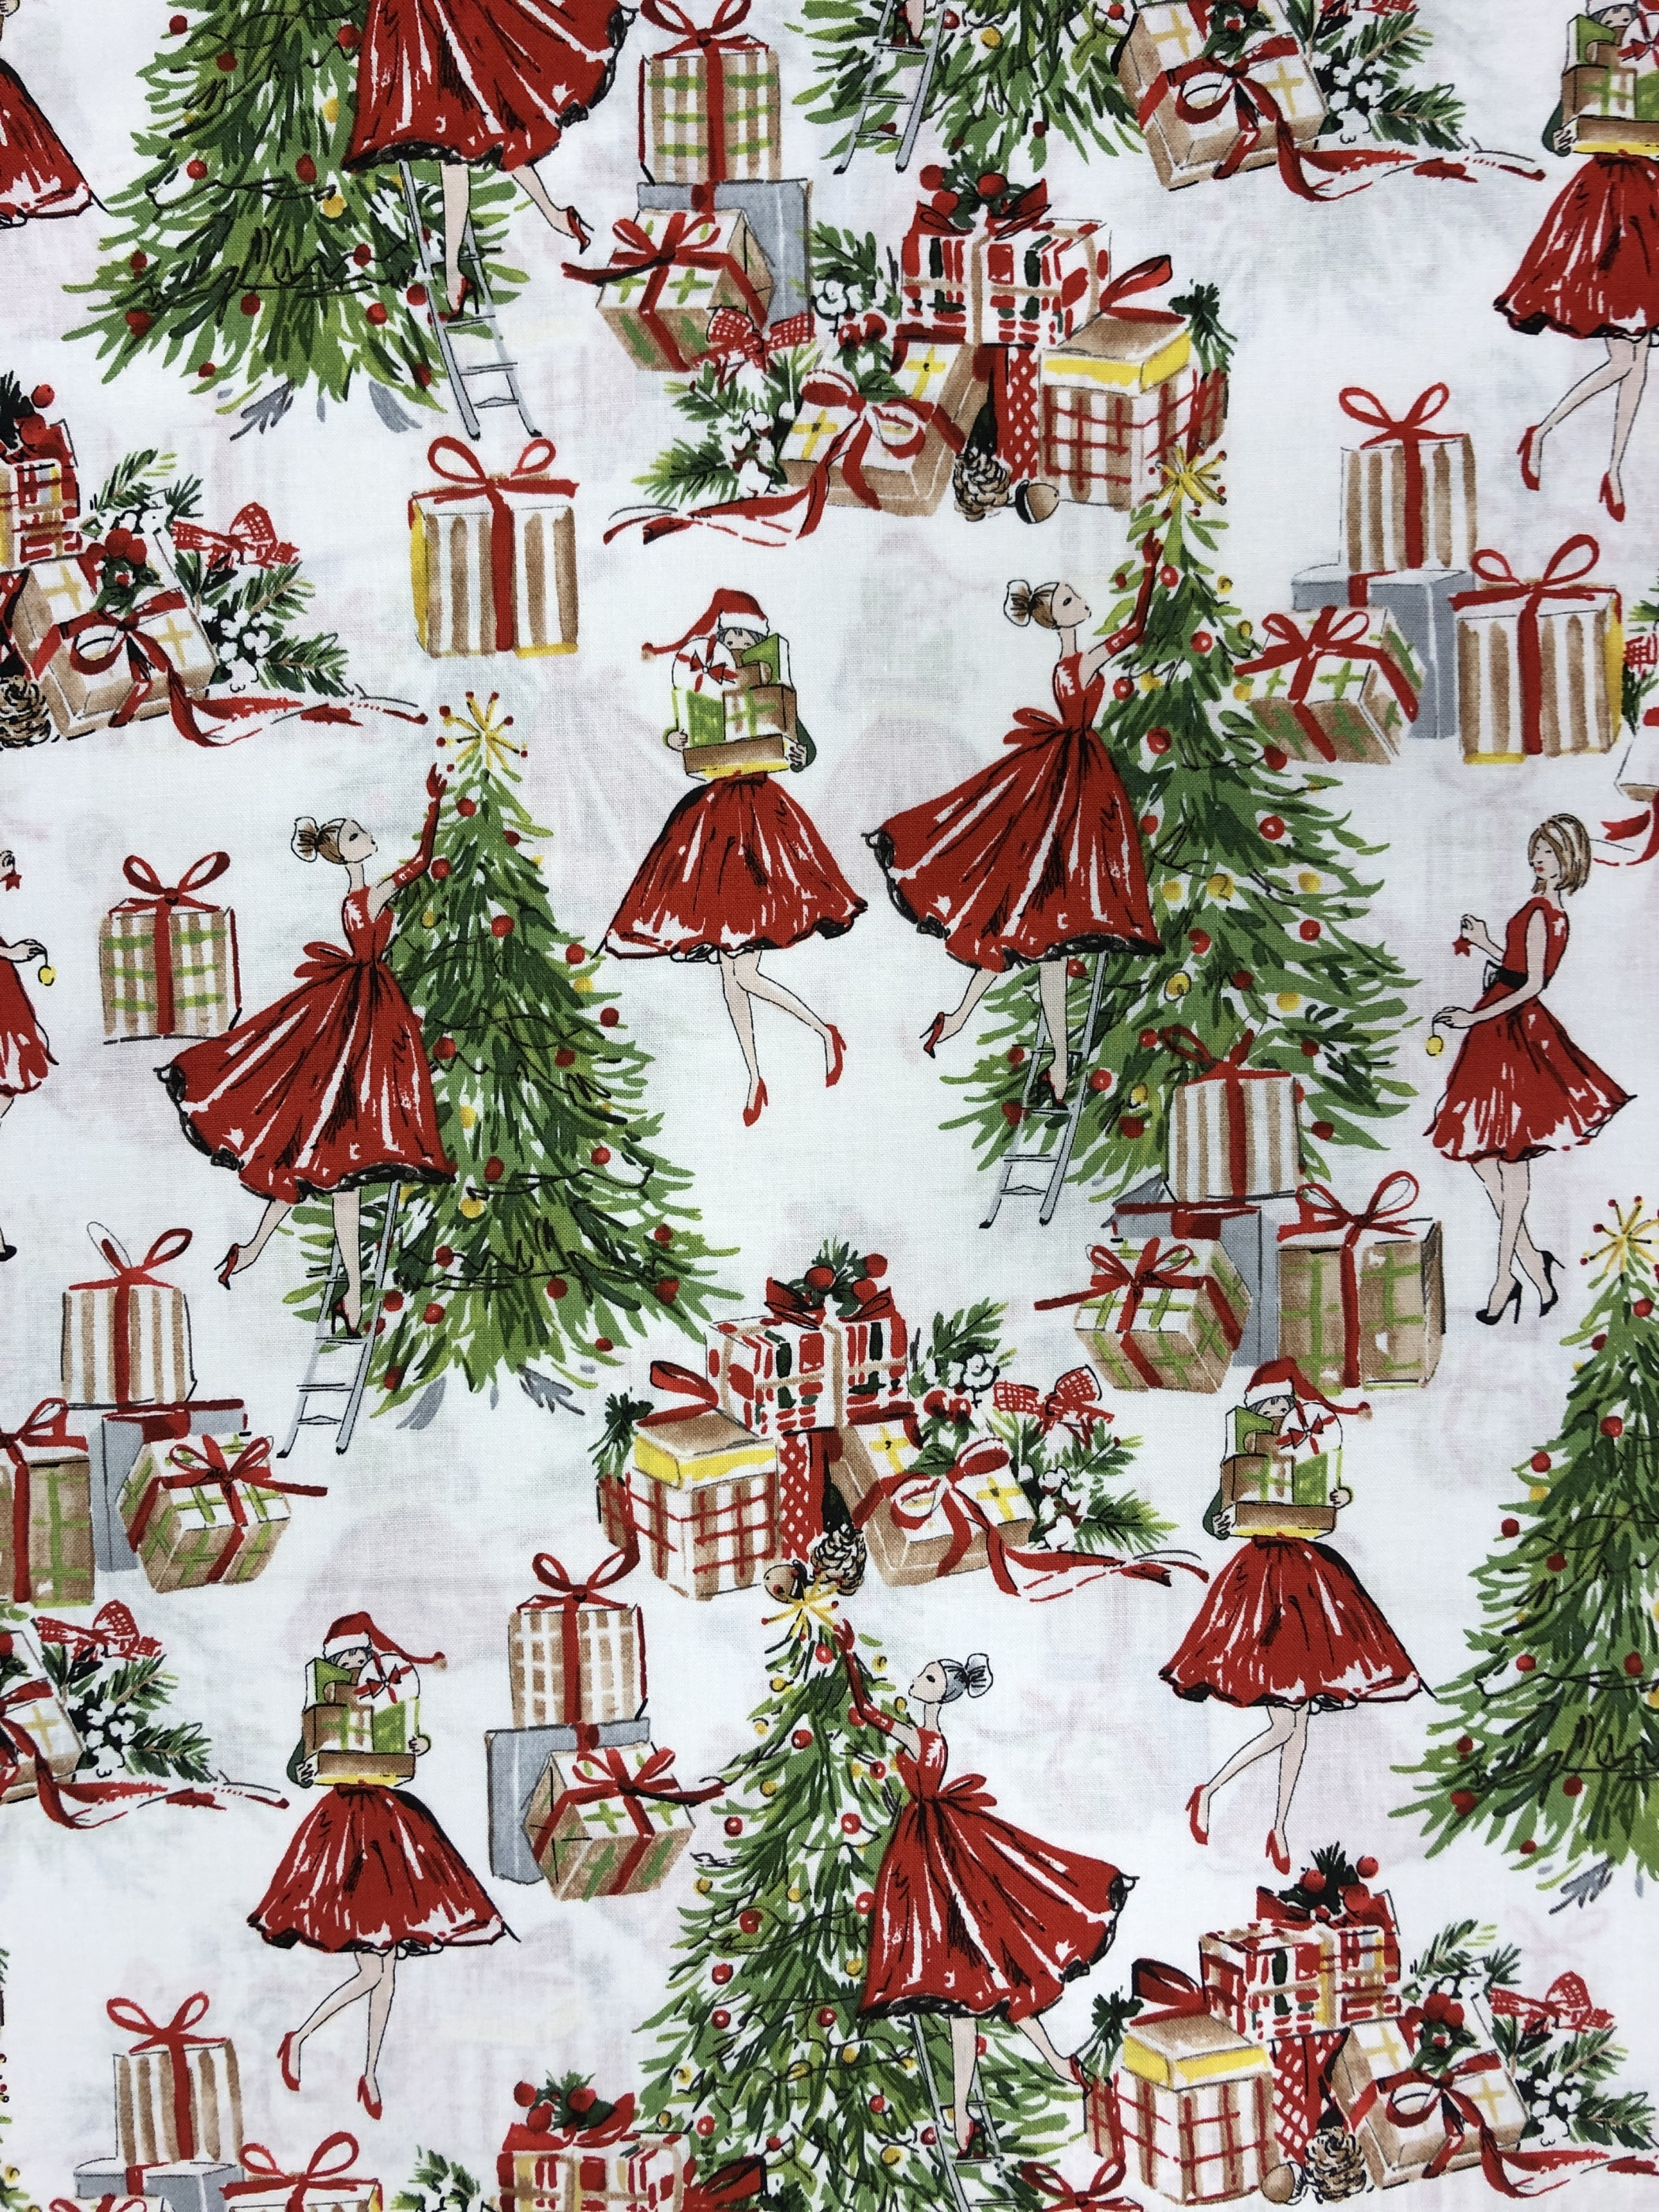 Jul jultyg Christmas gran julklapp tyglust laholm